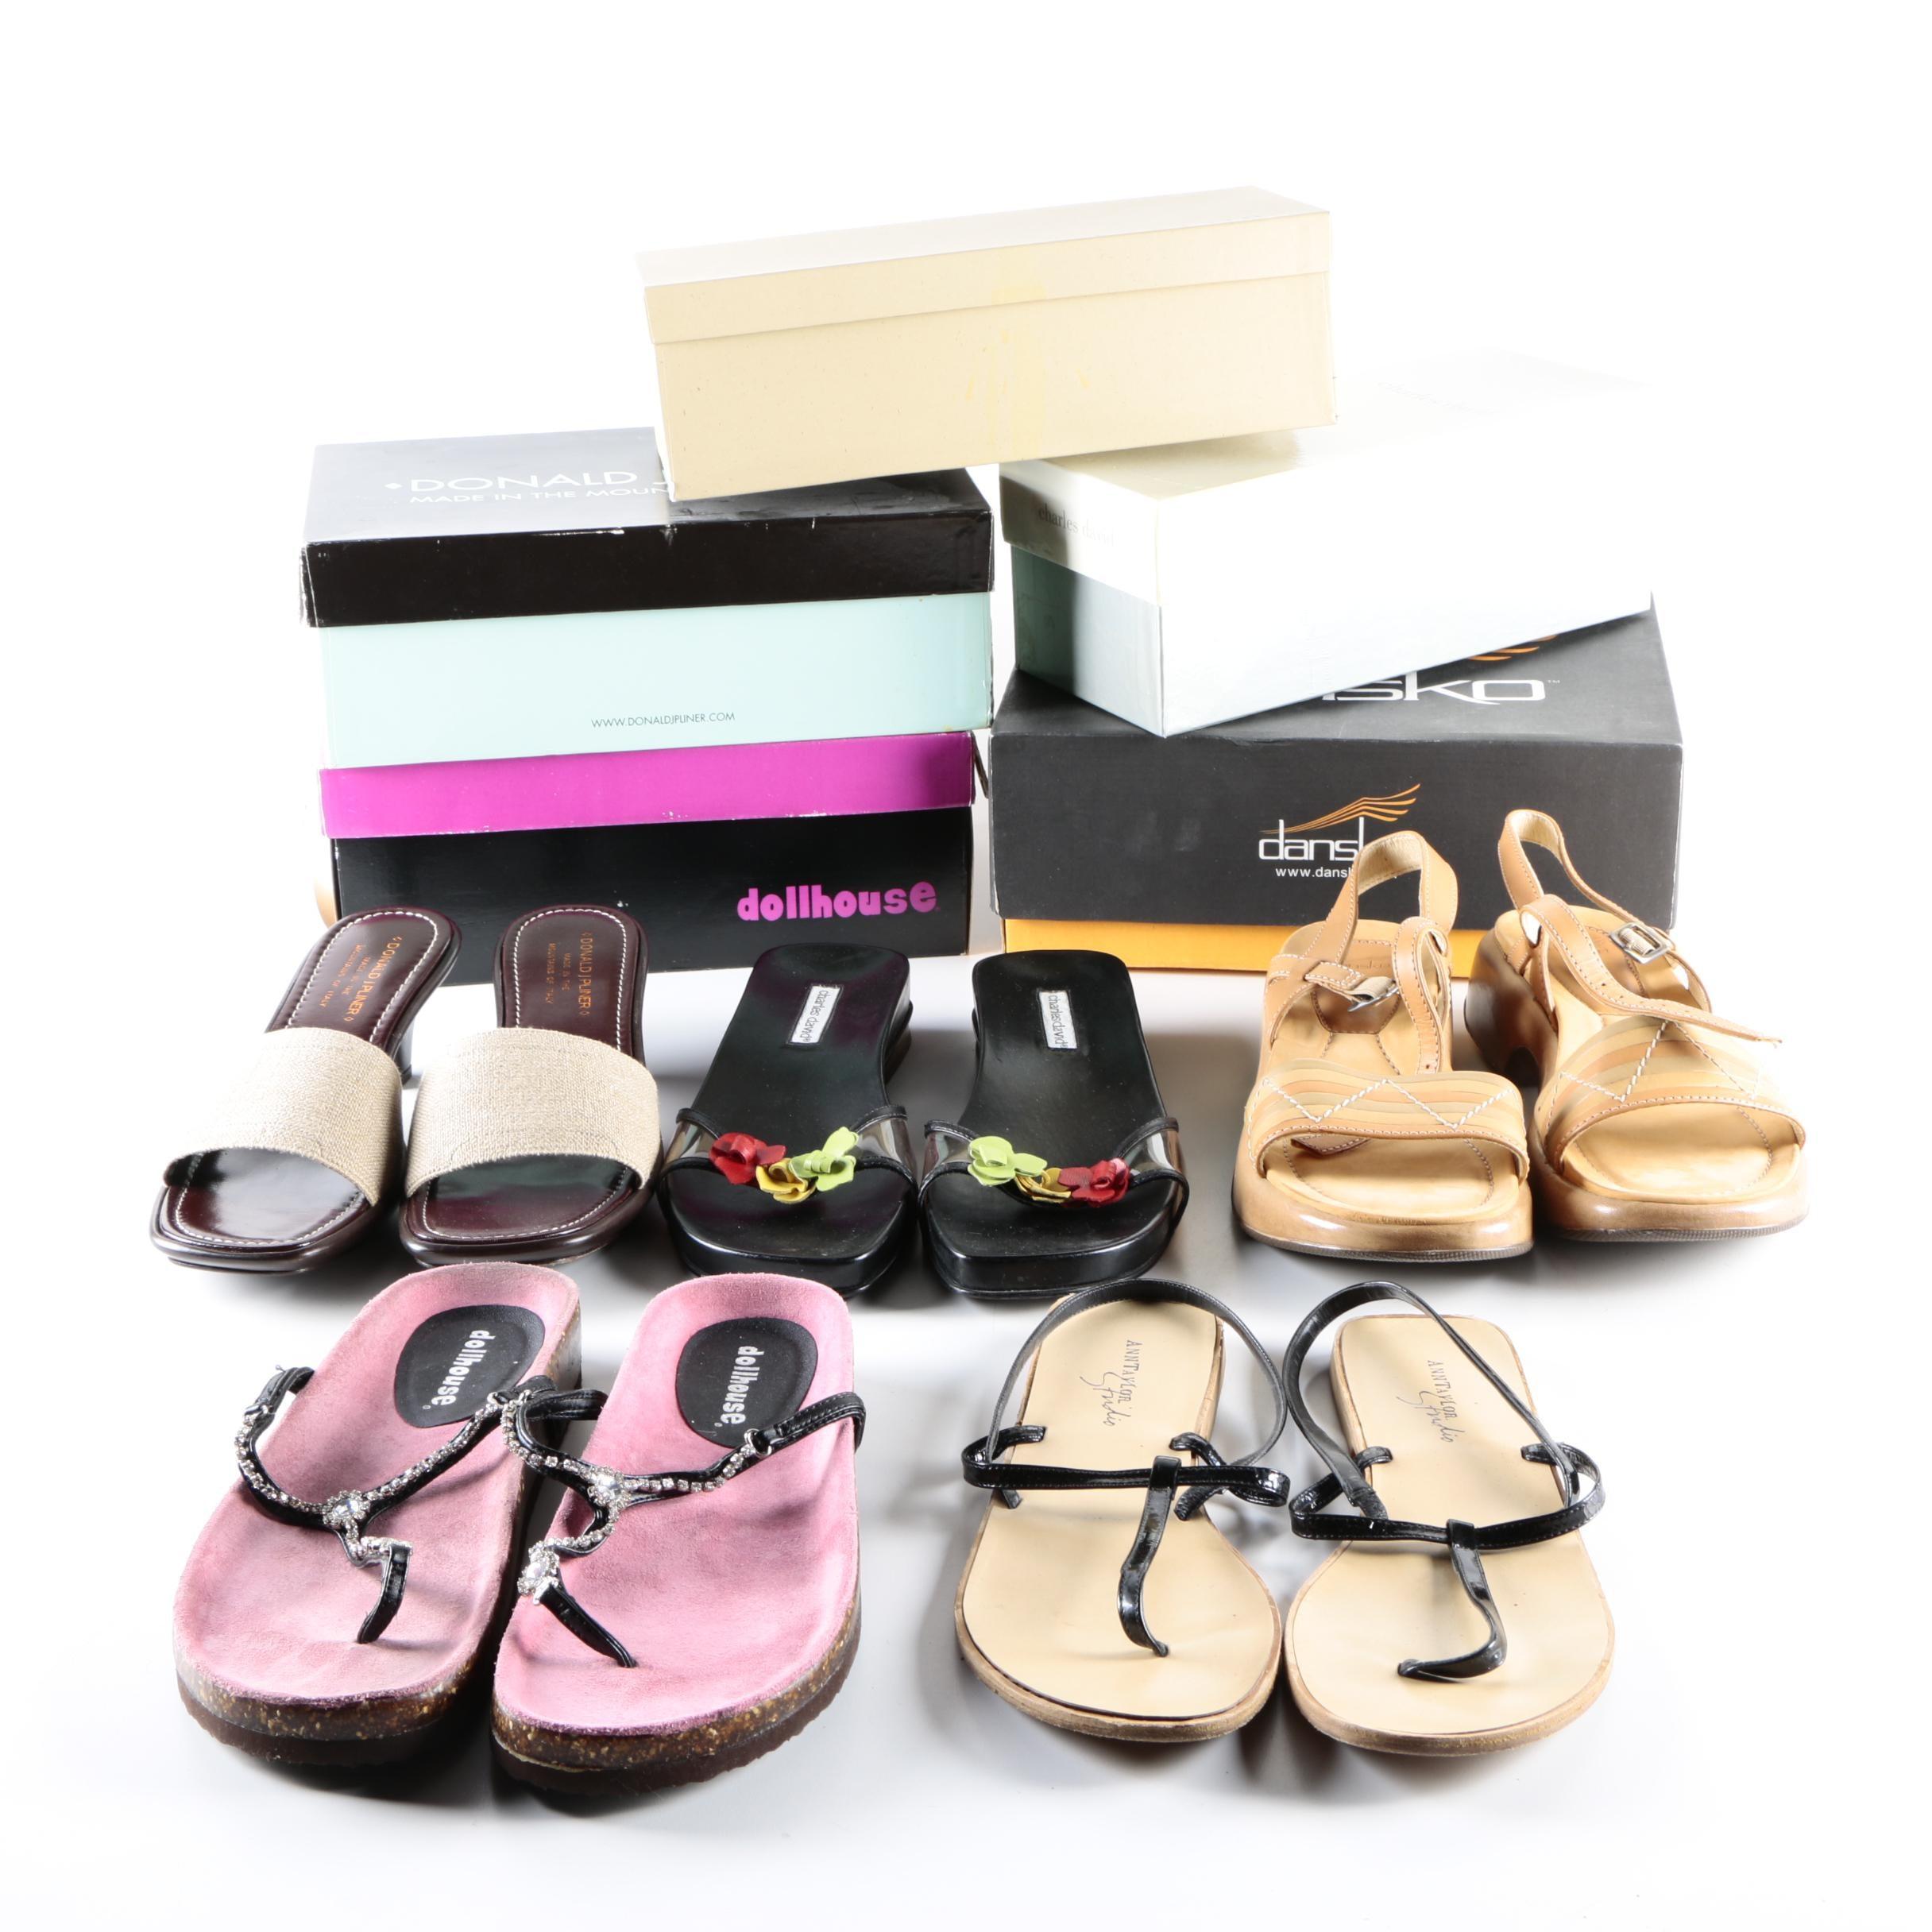 Women's Sandals Including Dansko and Donald J. Pliner